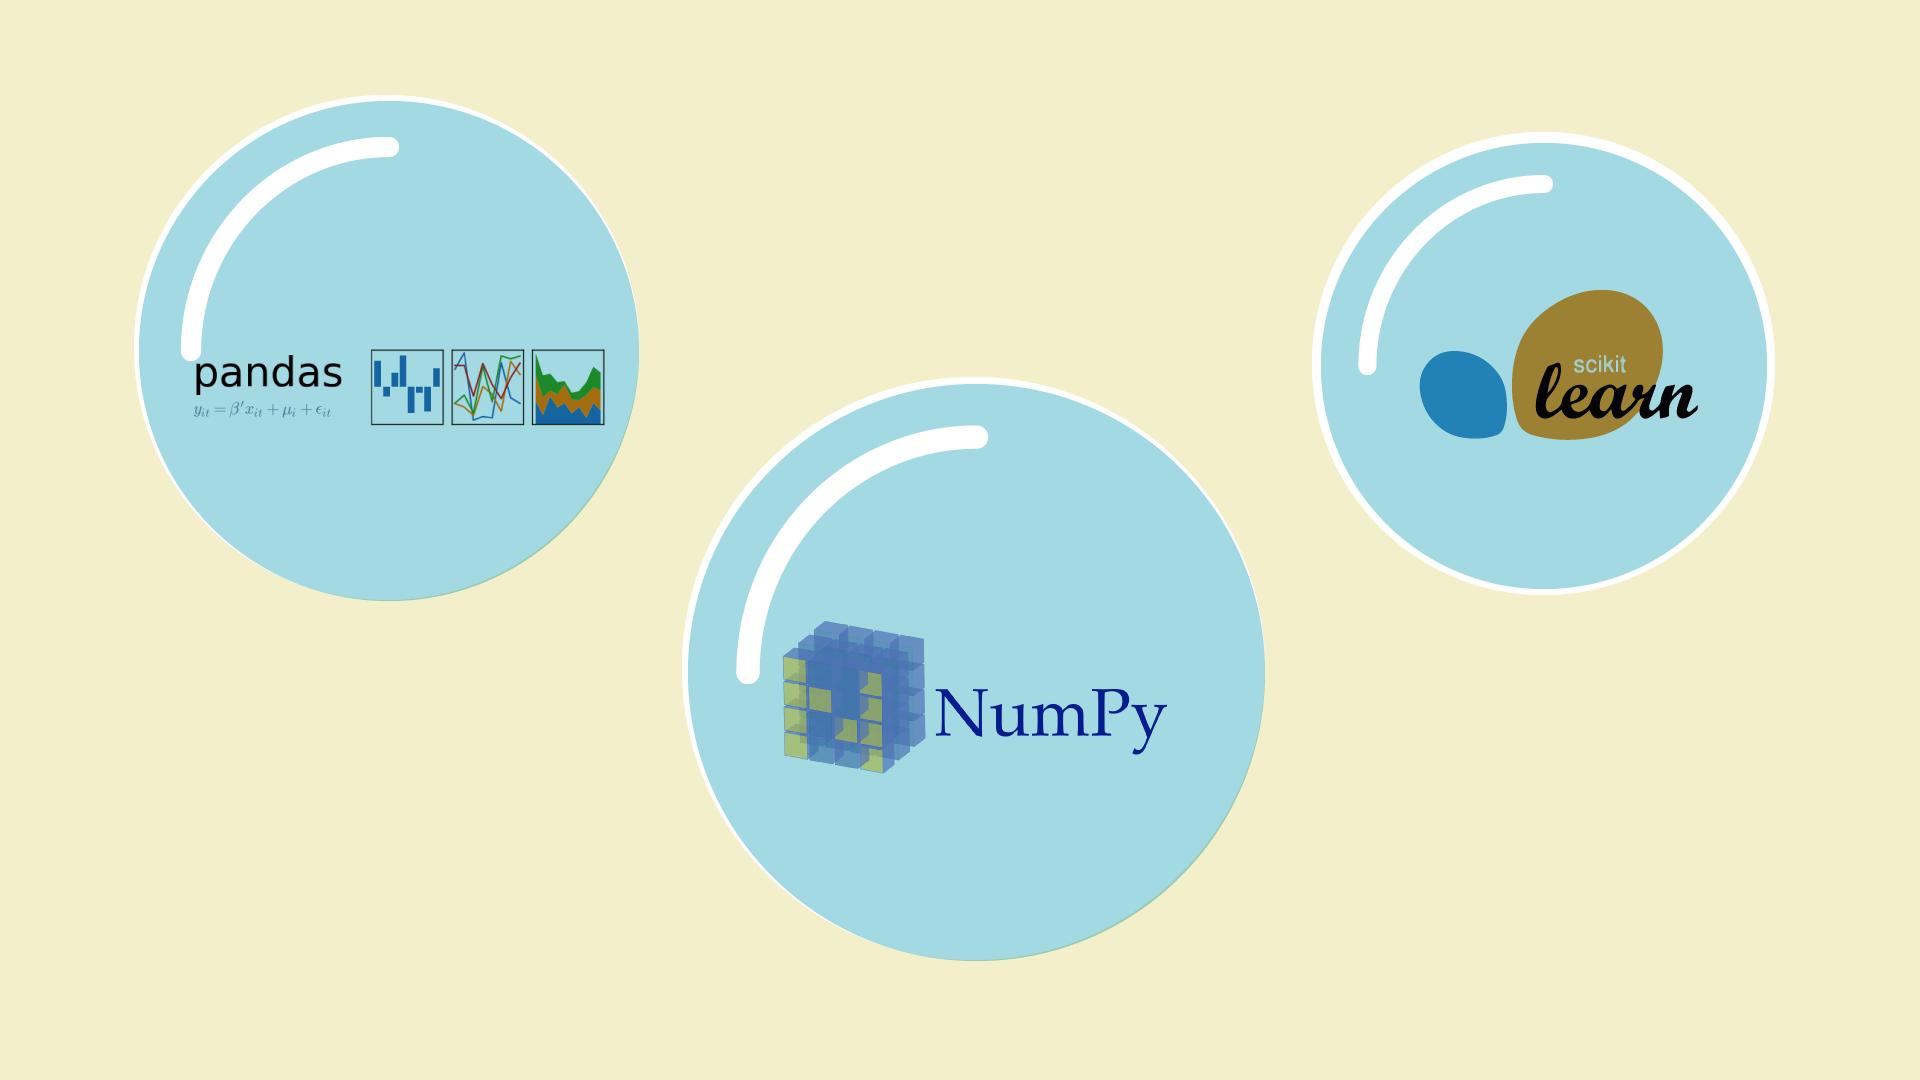 Three Bubbles holding the logos of pandas, scikit and NumPy